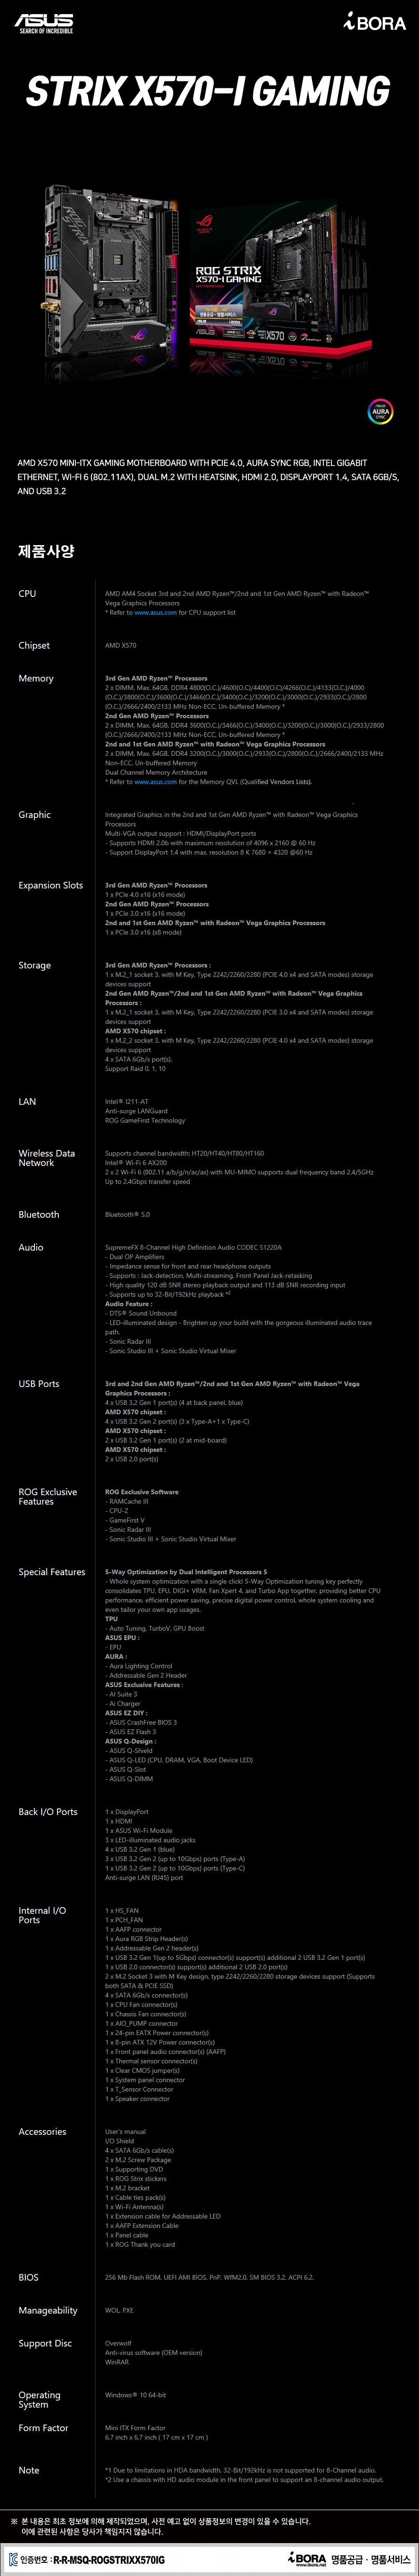 ASUS ROG STRIX X570-I GAMING 아이보라